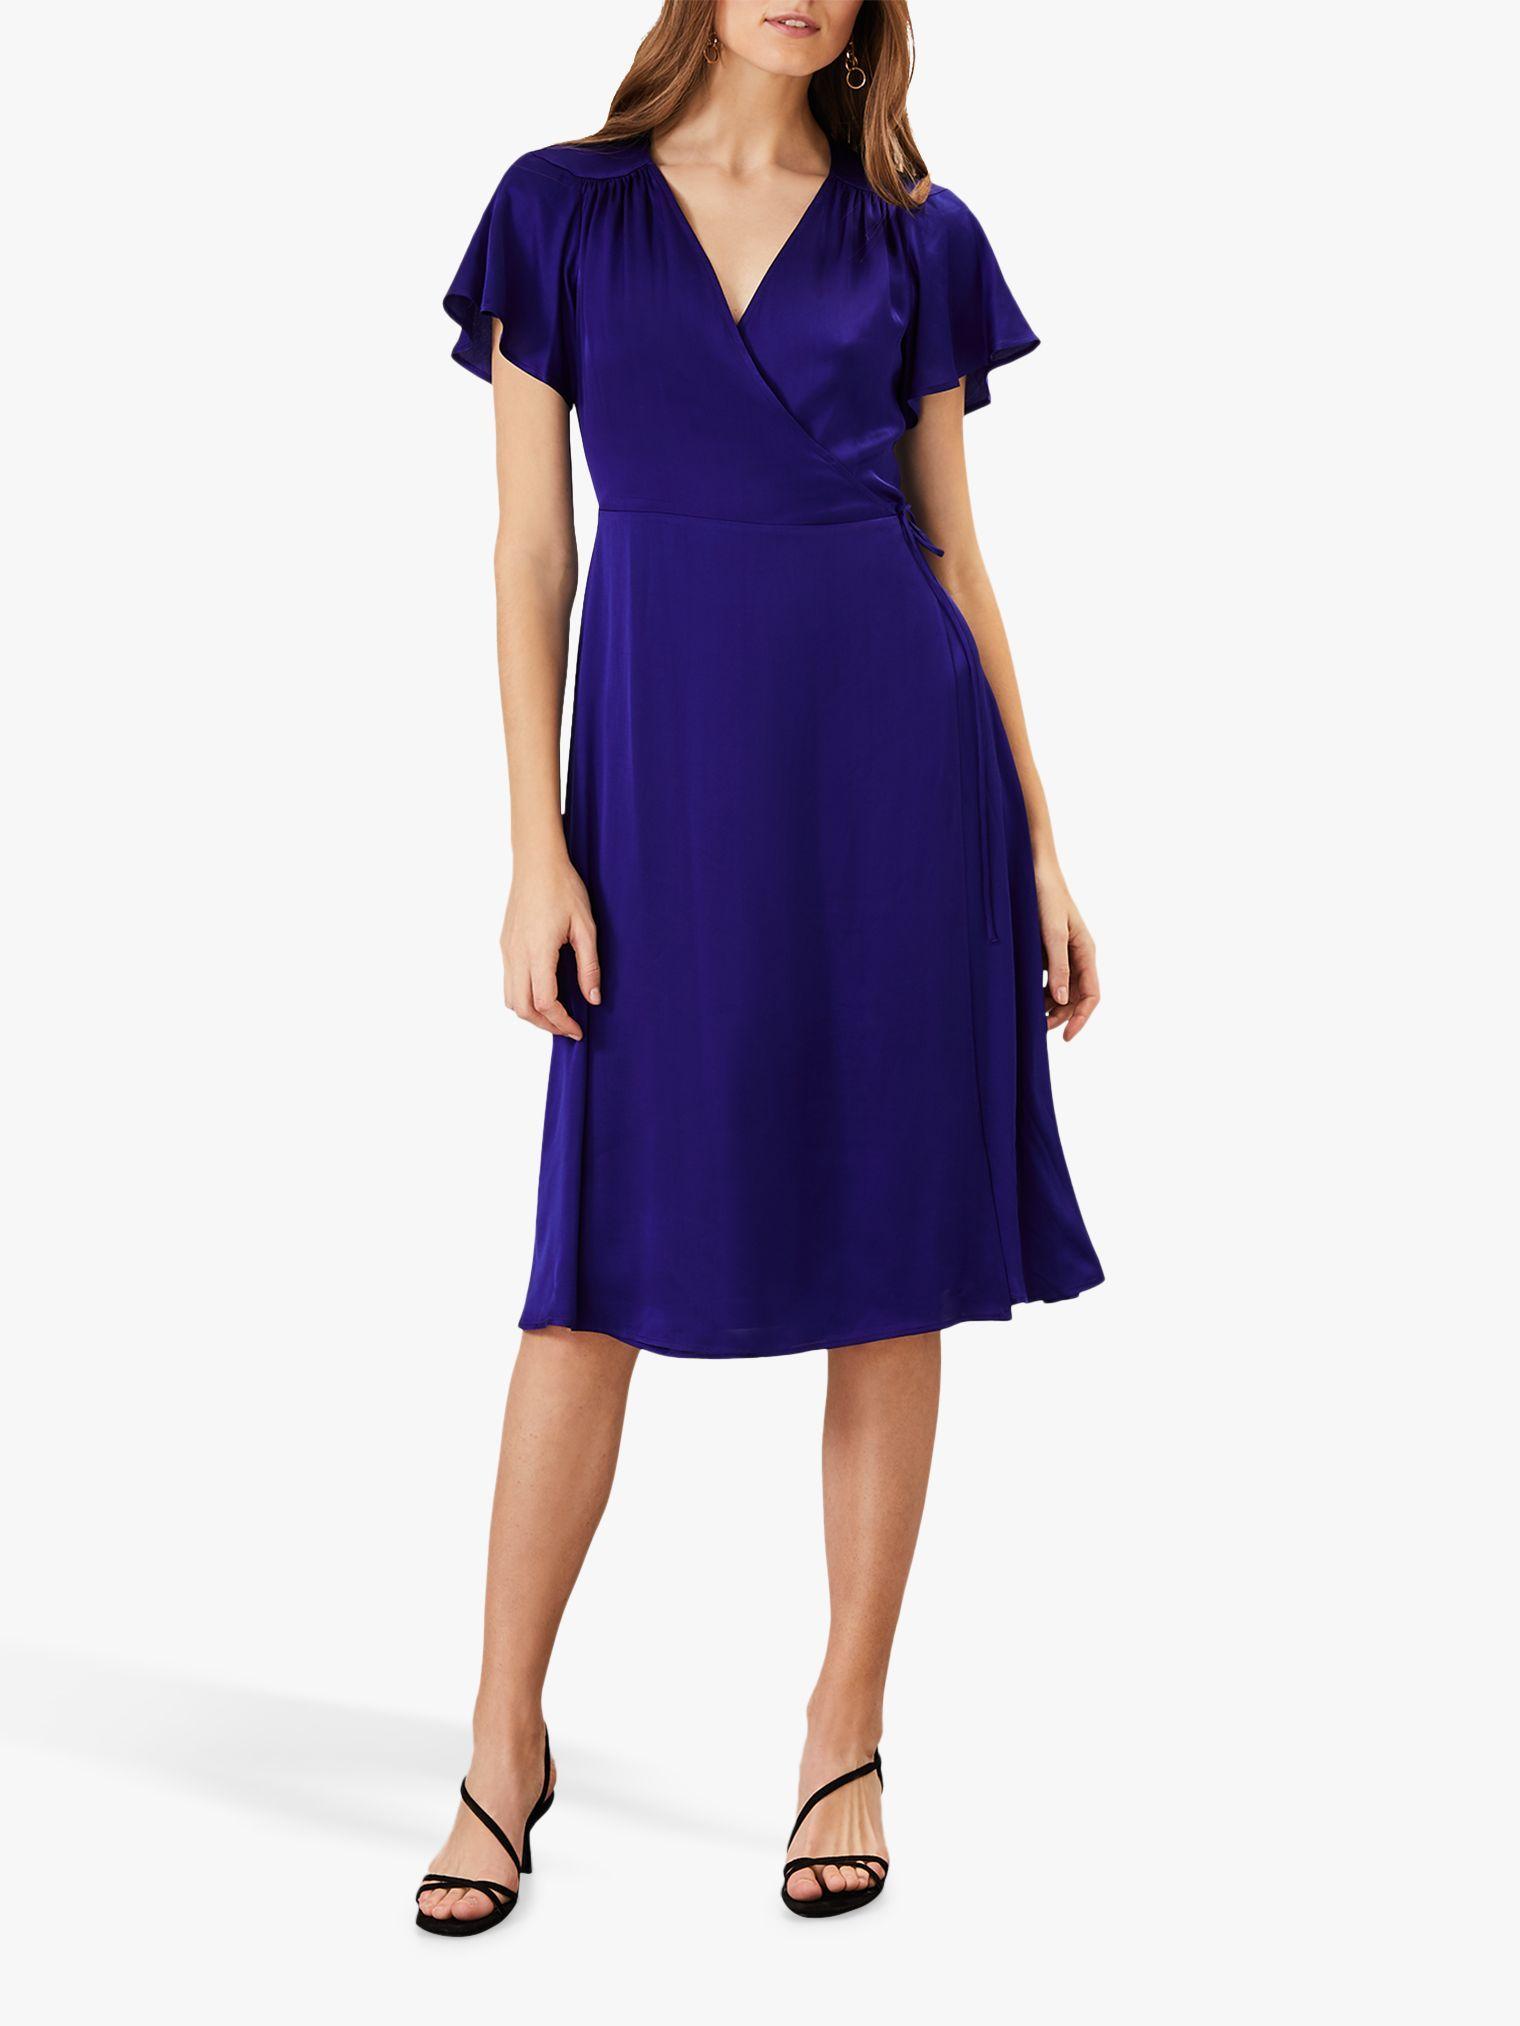 Phase Eight Sasha Satin Dress, Cobalt #cobaltdress